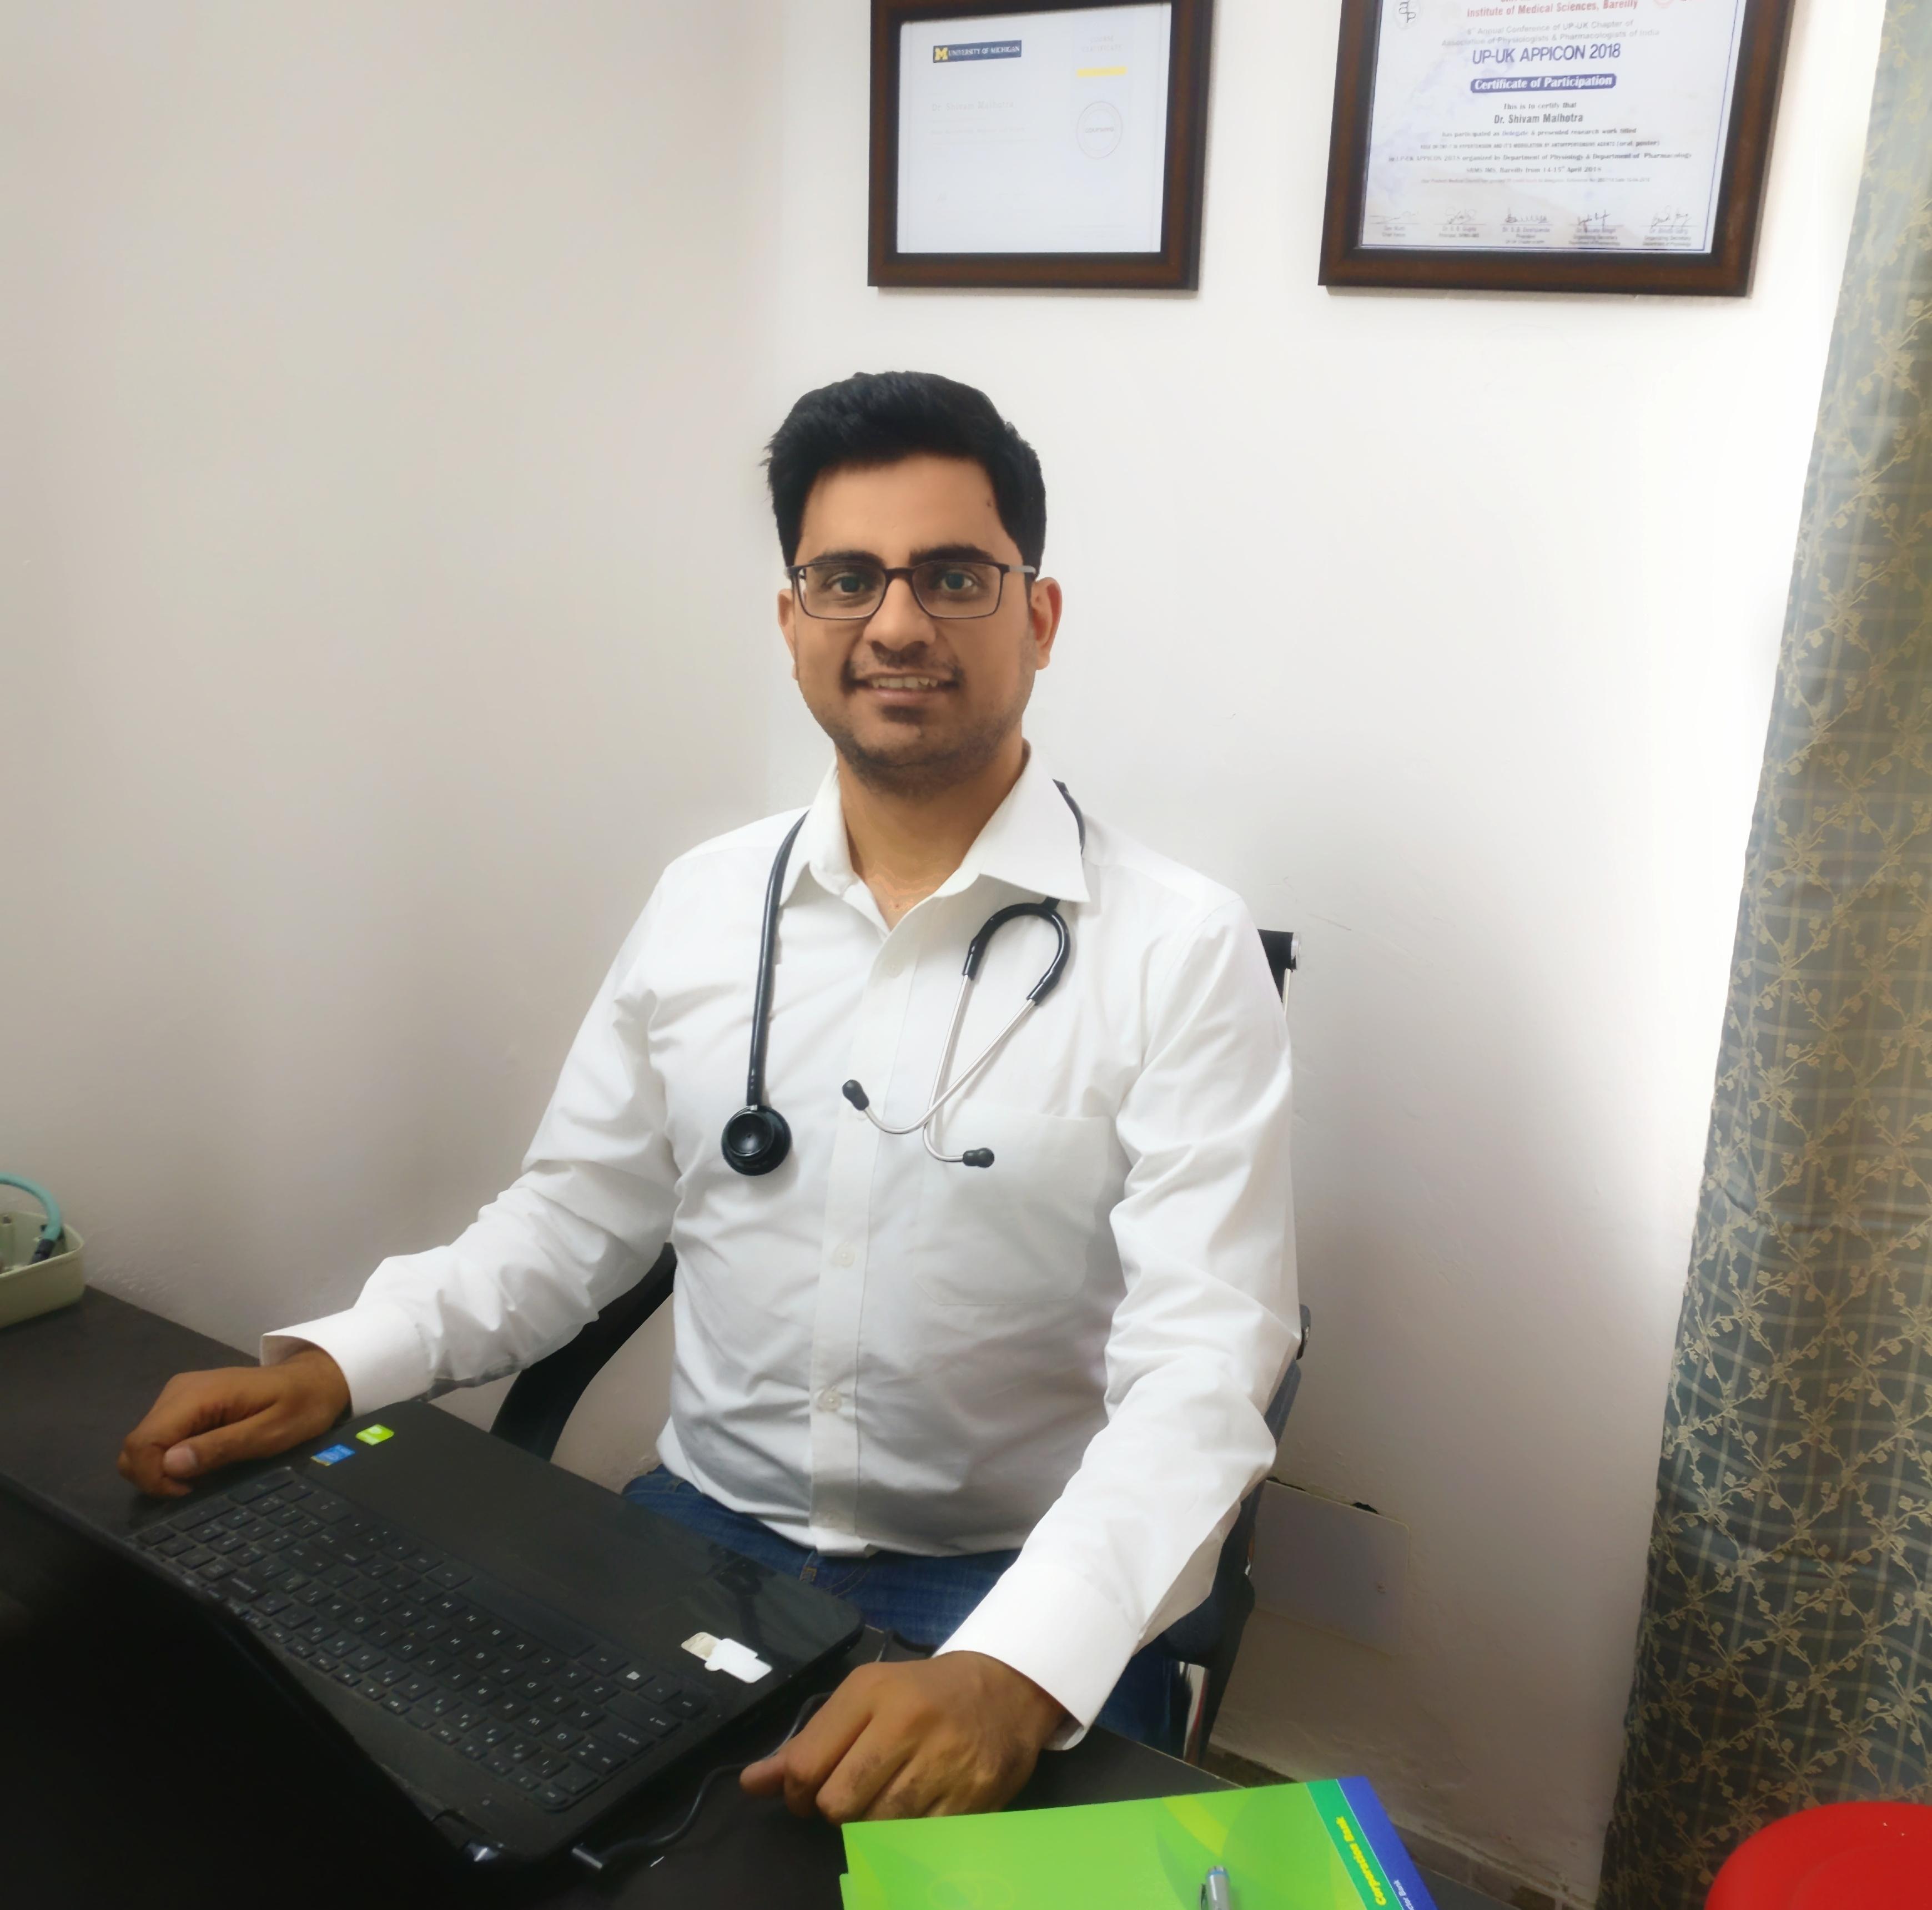 Noor clinic in Shivaji Nagar, Bangalore - Book Appointment